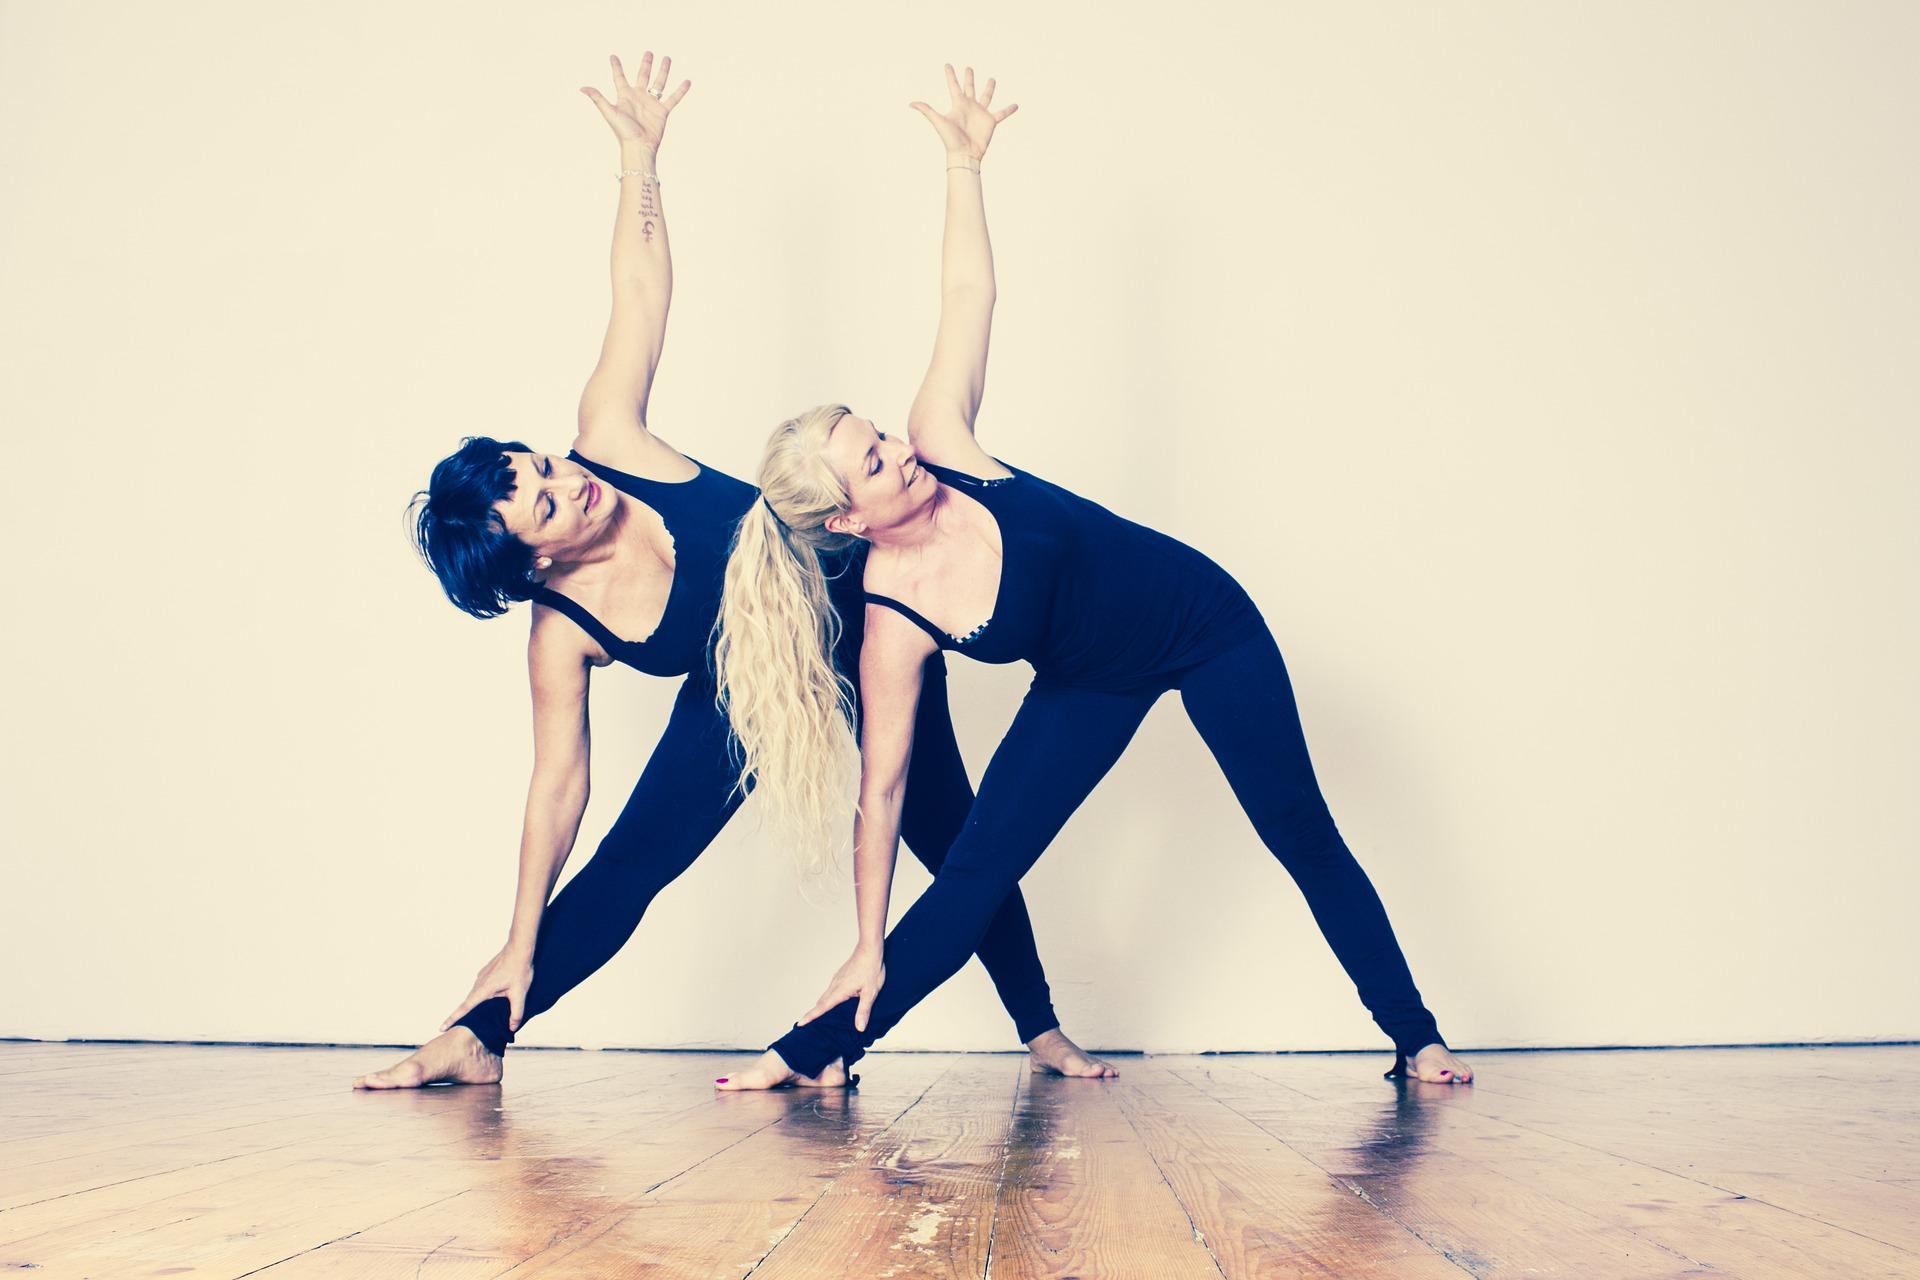 maty kauczukowe do jogi